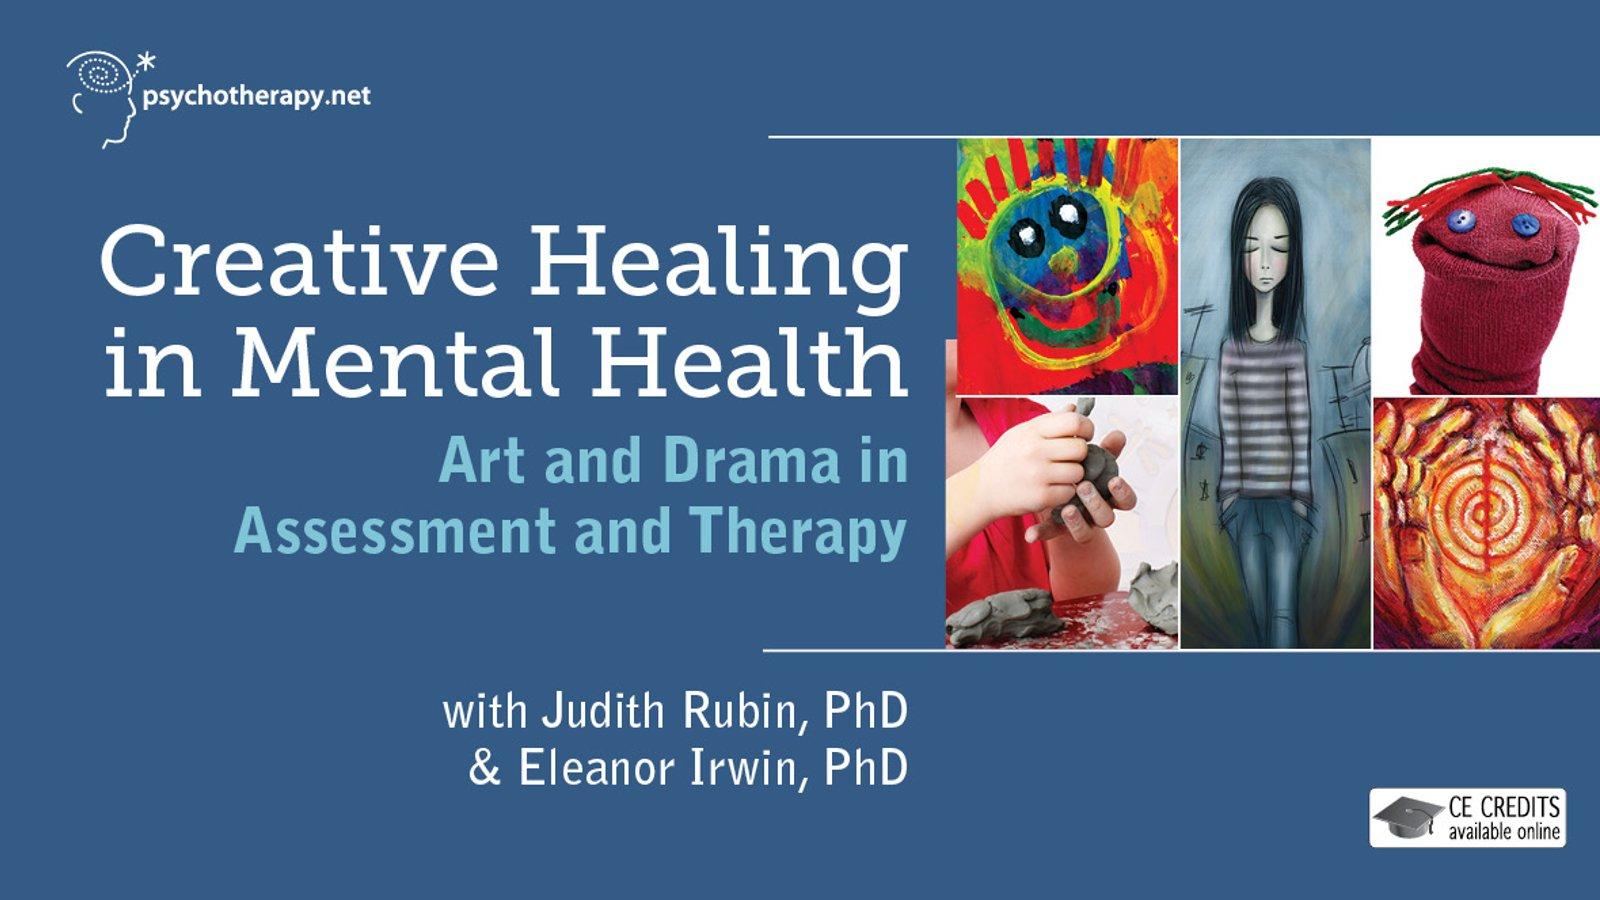 Creative Healing in Mental Health